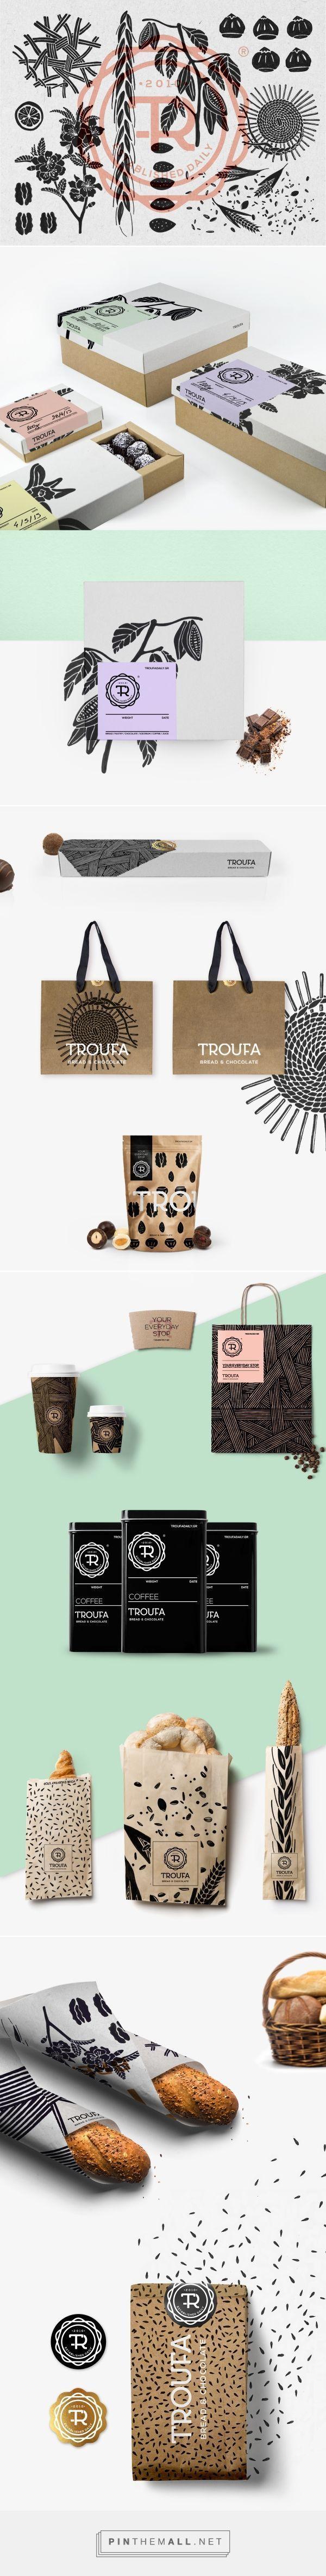 Troufa Branding on Behance | Fivestar Branding – Design and Branding Agency & Inspiration Gallery::